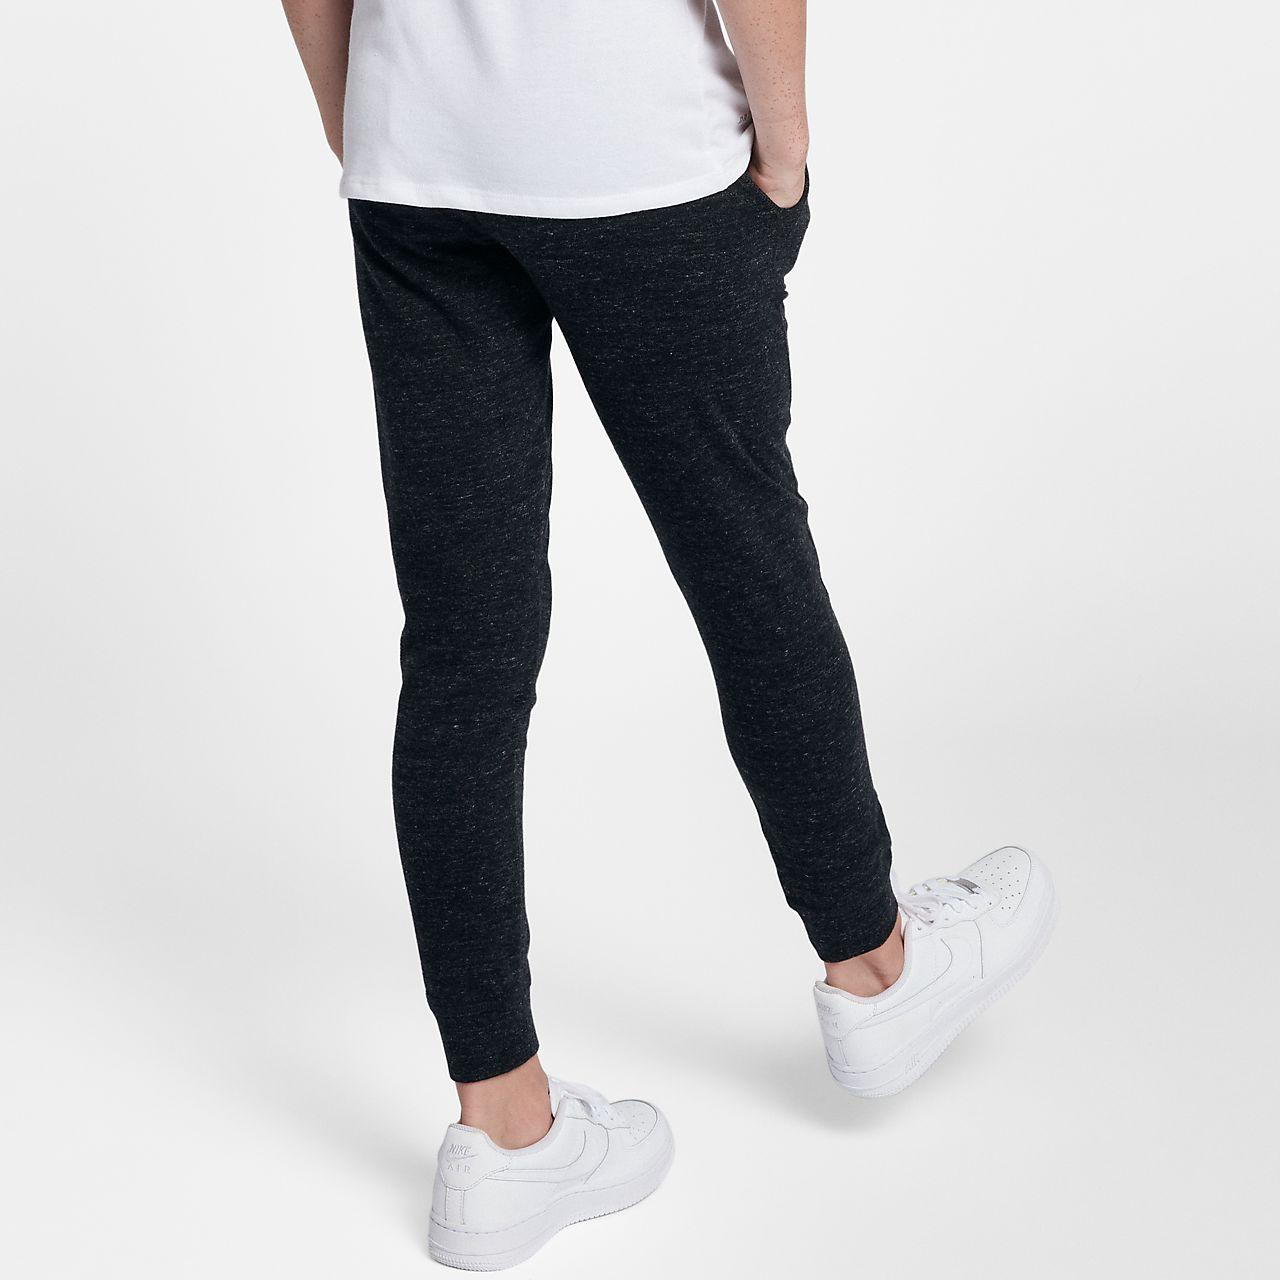 pantaloni nike ragazza